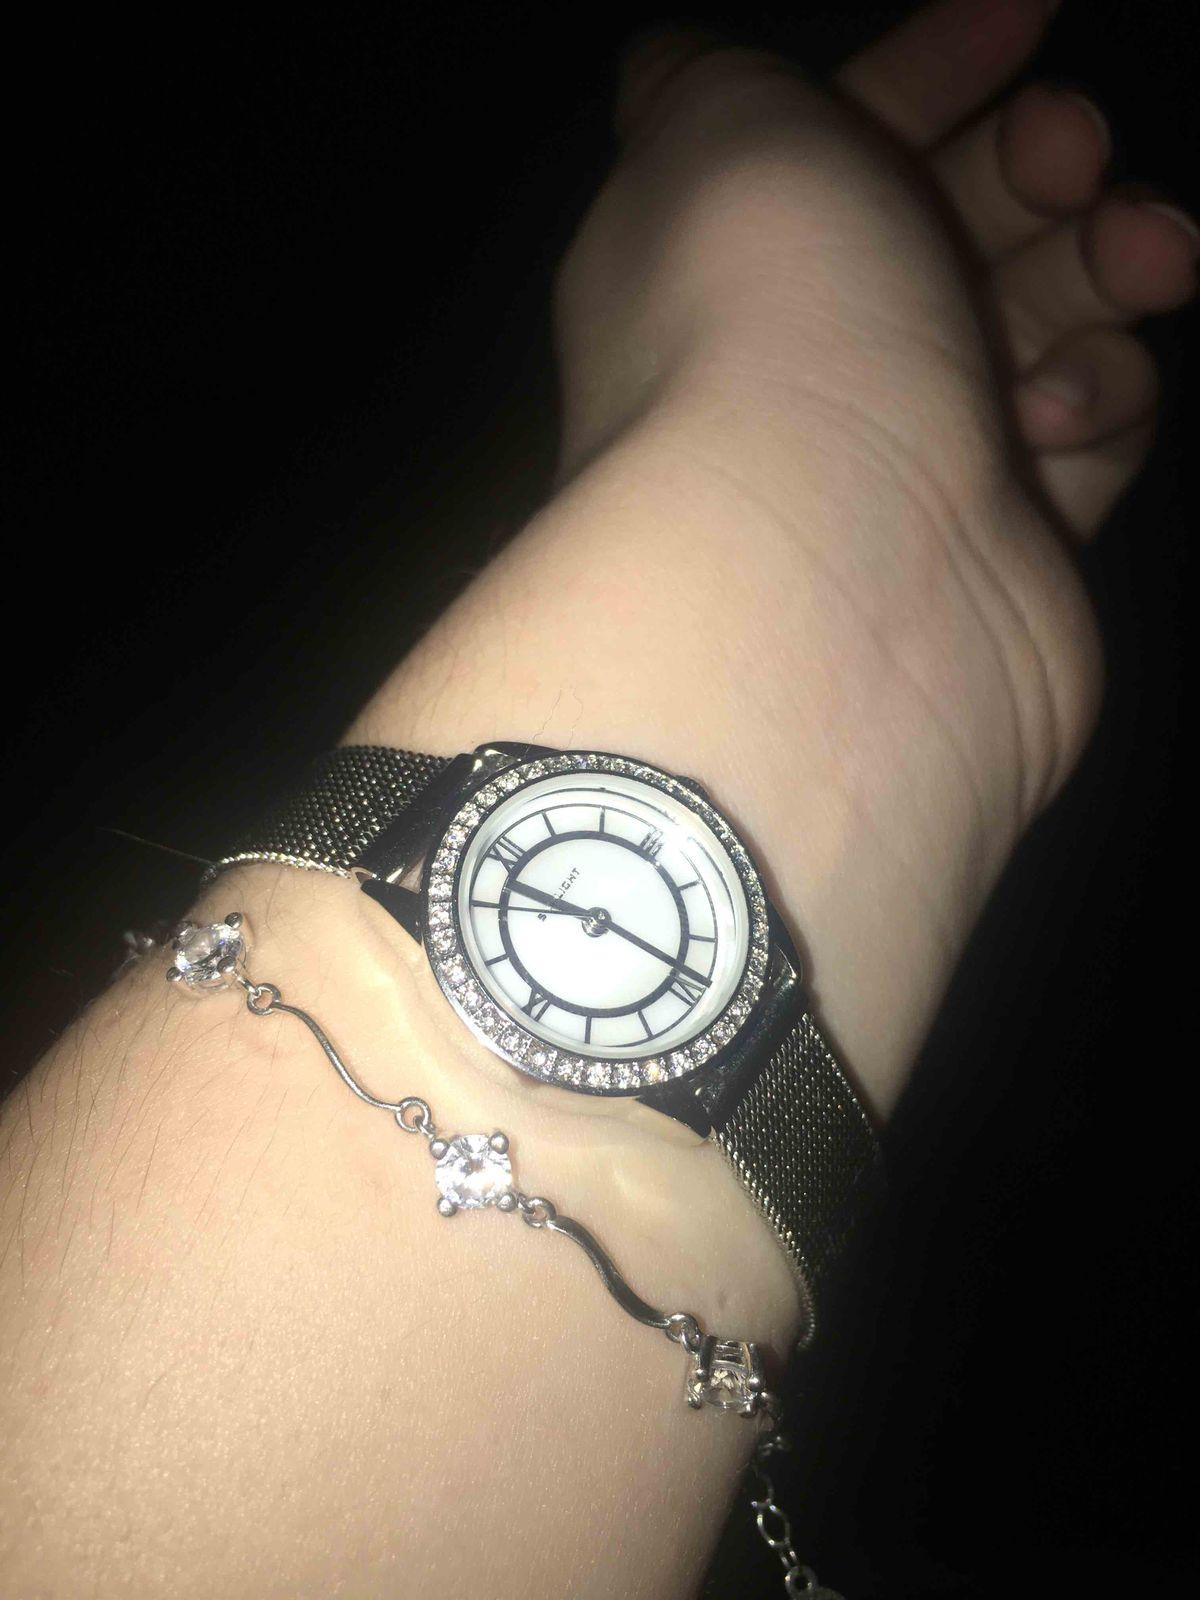 Часы прекрастные